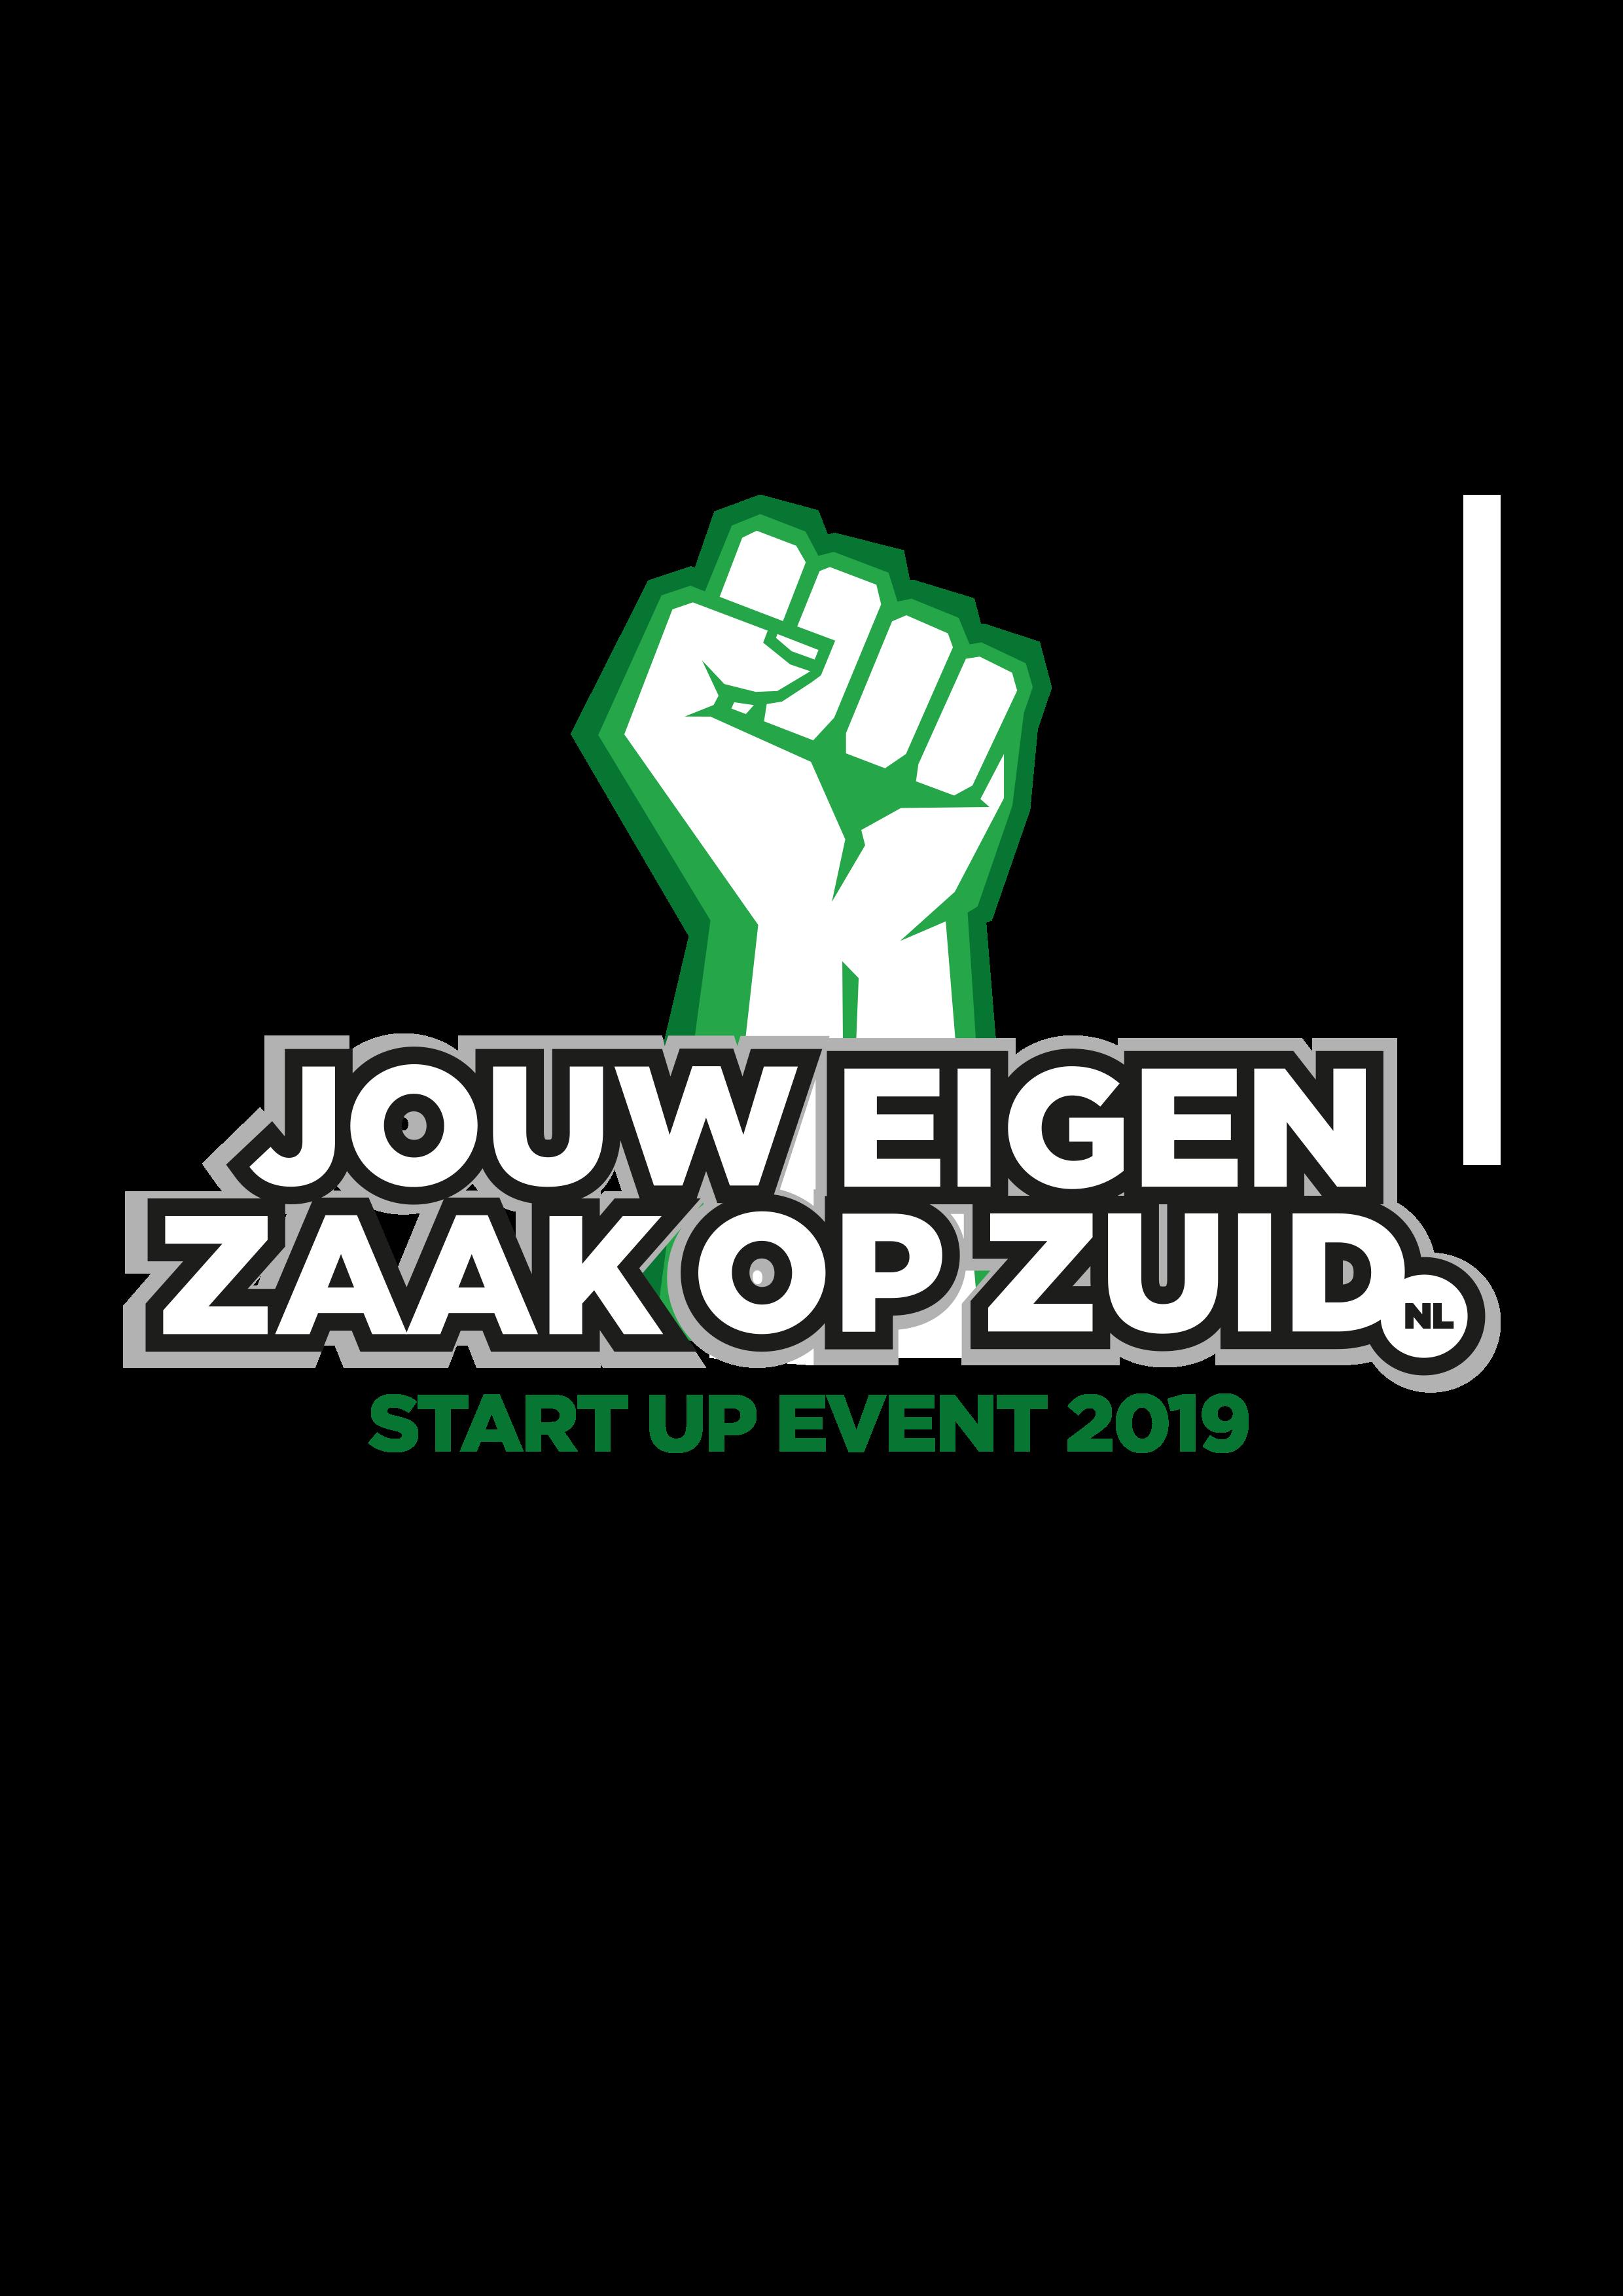 JEZOZ-logo.png